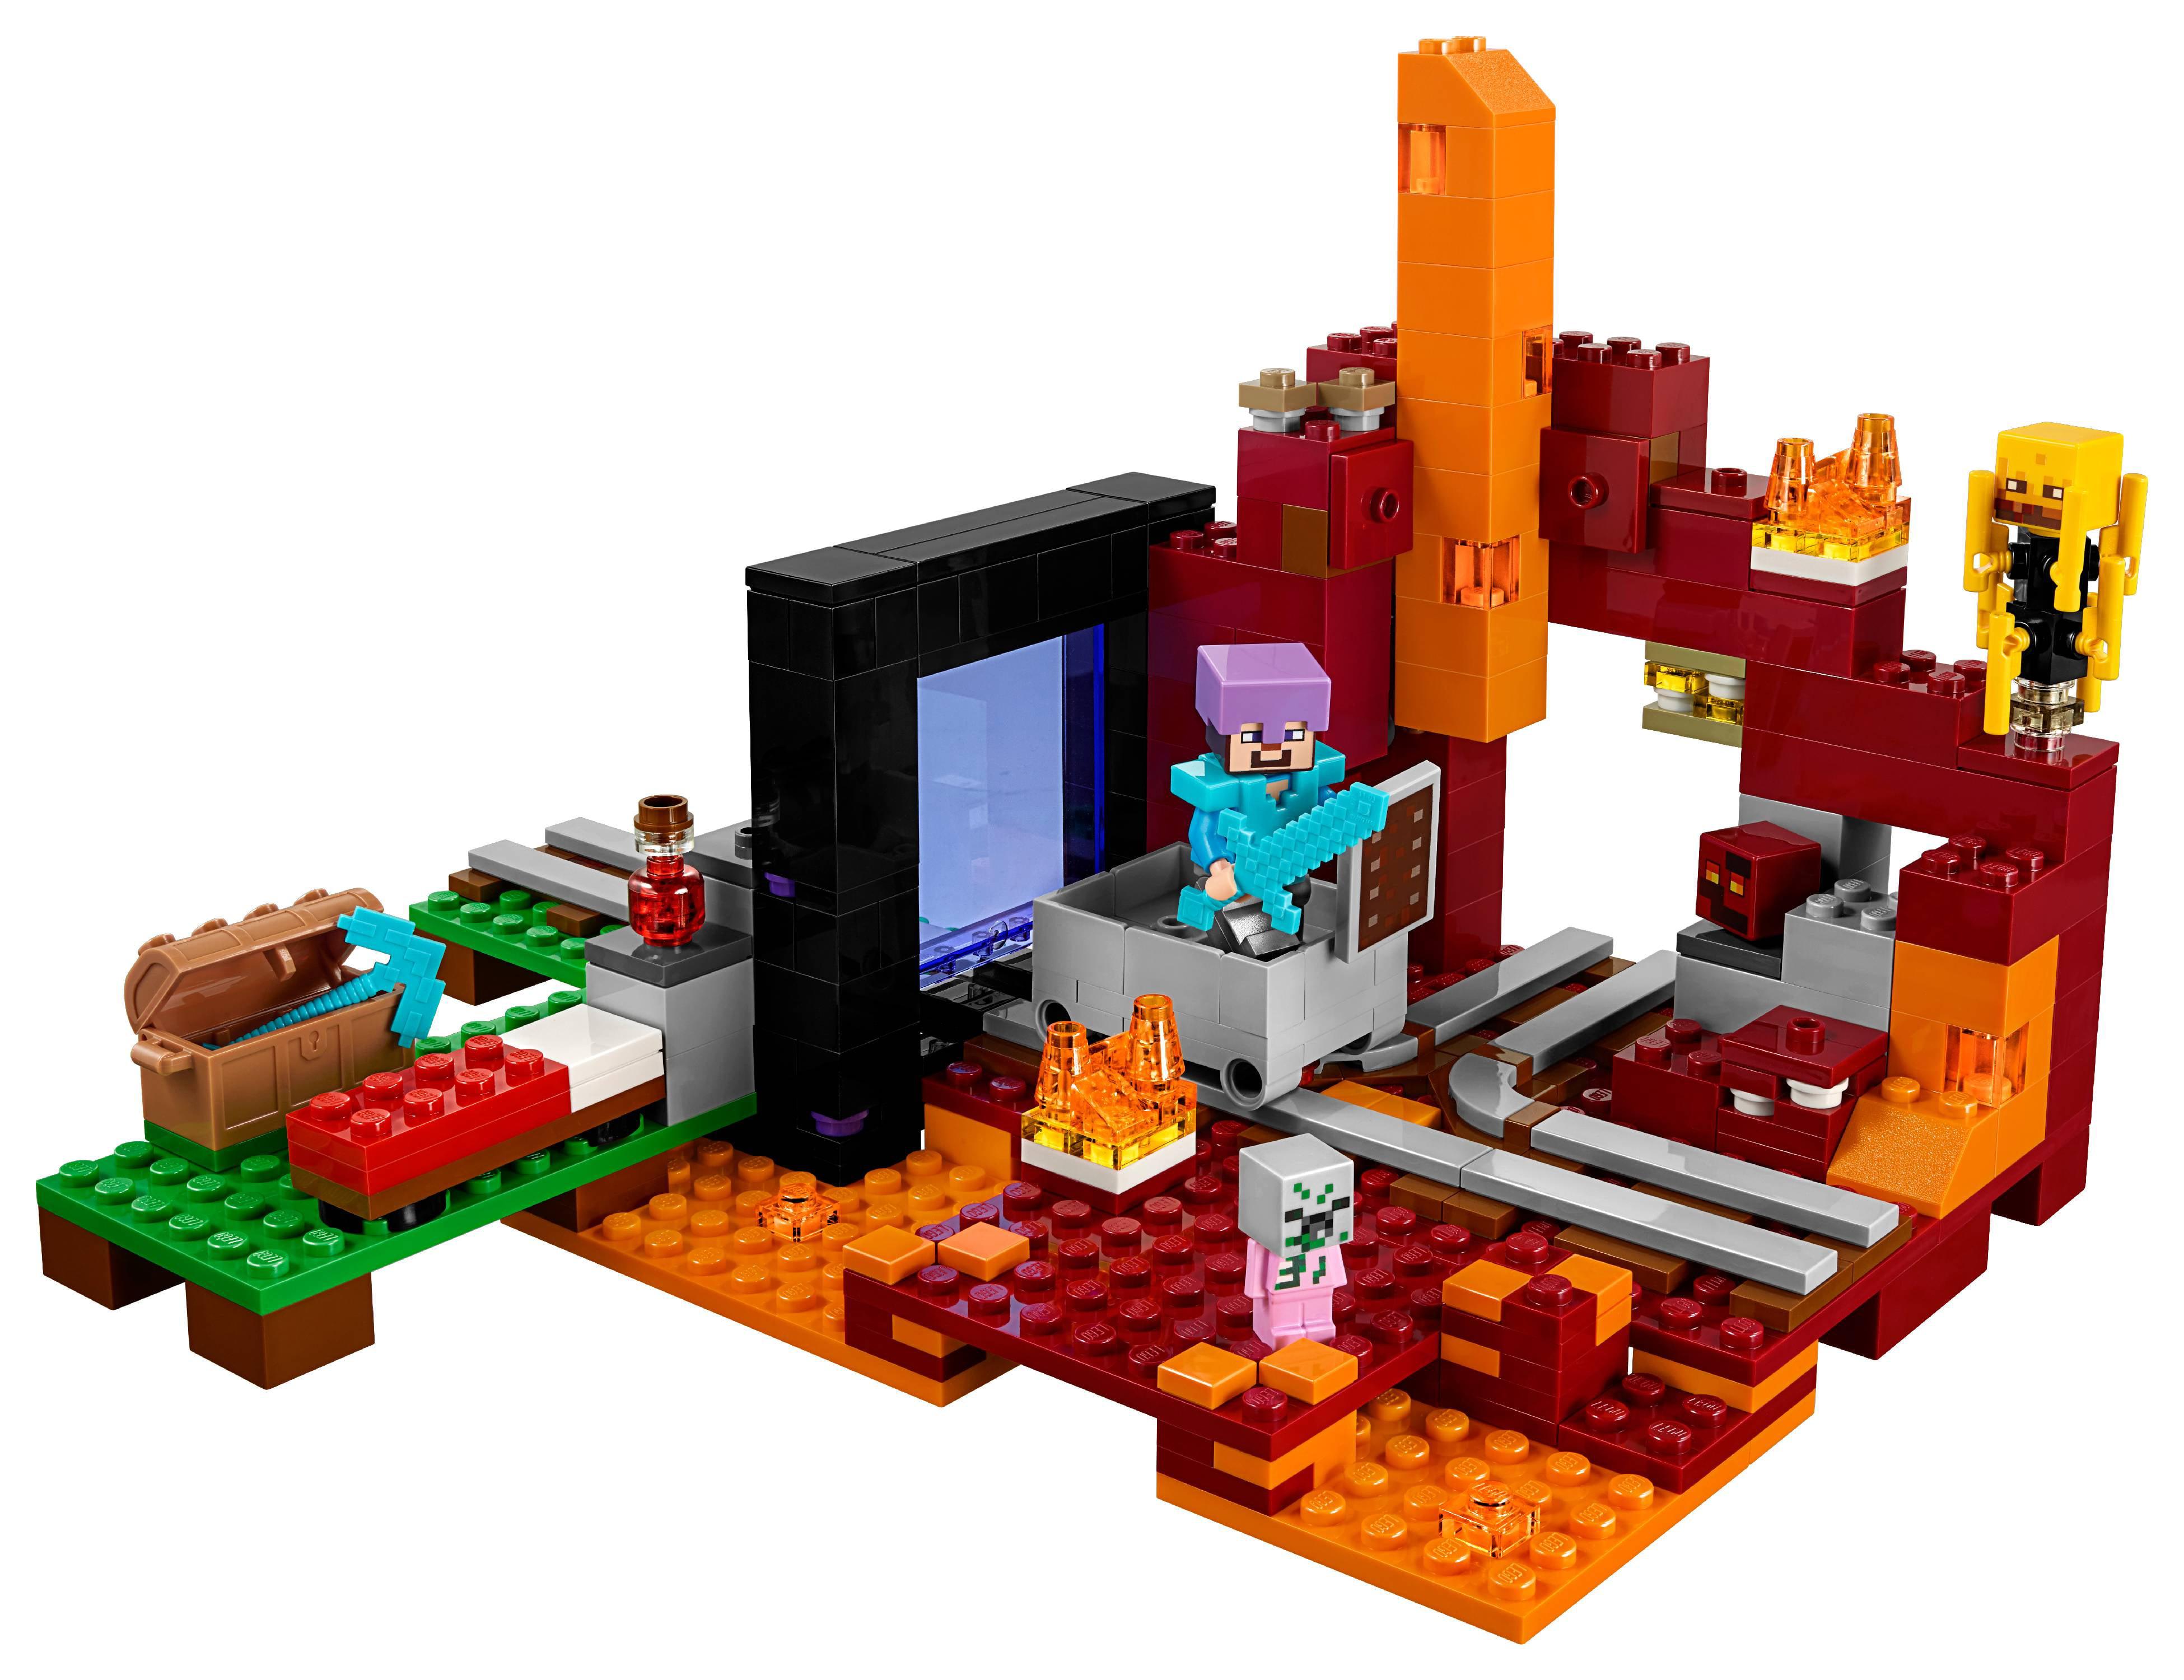 470 Pcs NEW LEGO Minecraft The Nether Portal 21143 Building Toy Set